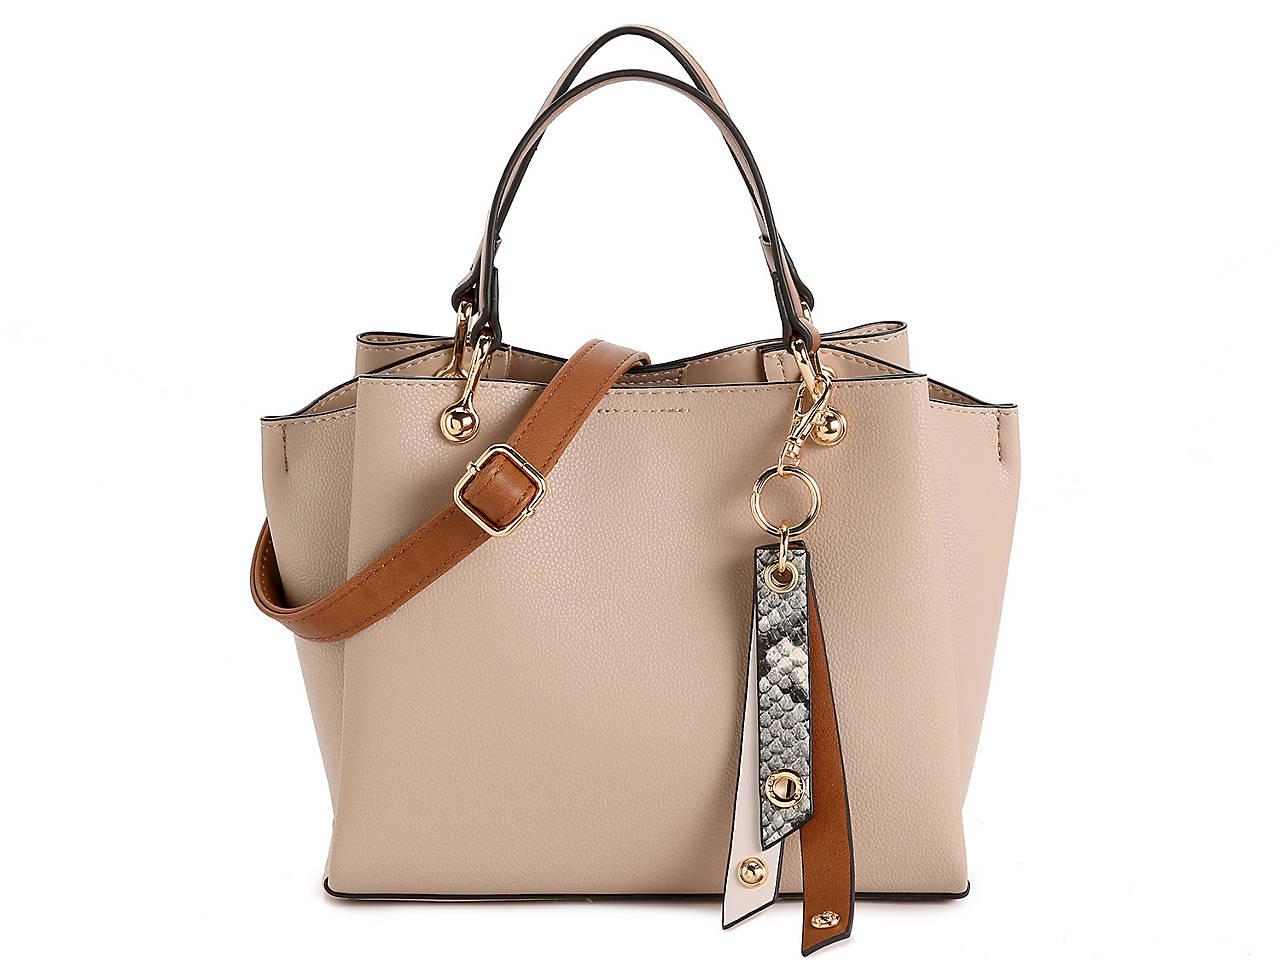 a74ad3c861d Aldo Viremma Satchel Women's Handbags & Accessories | DSW